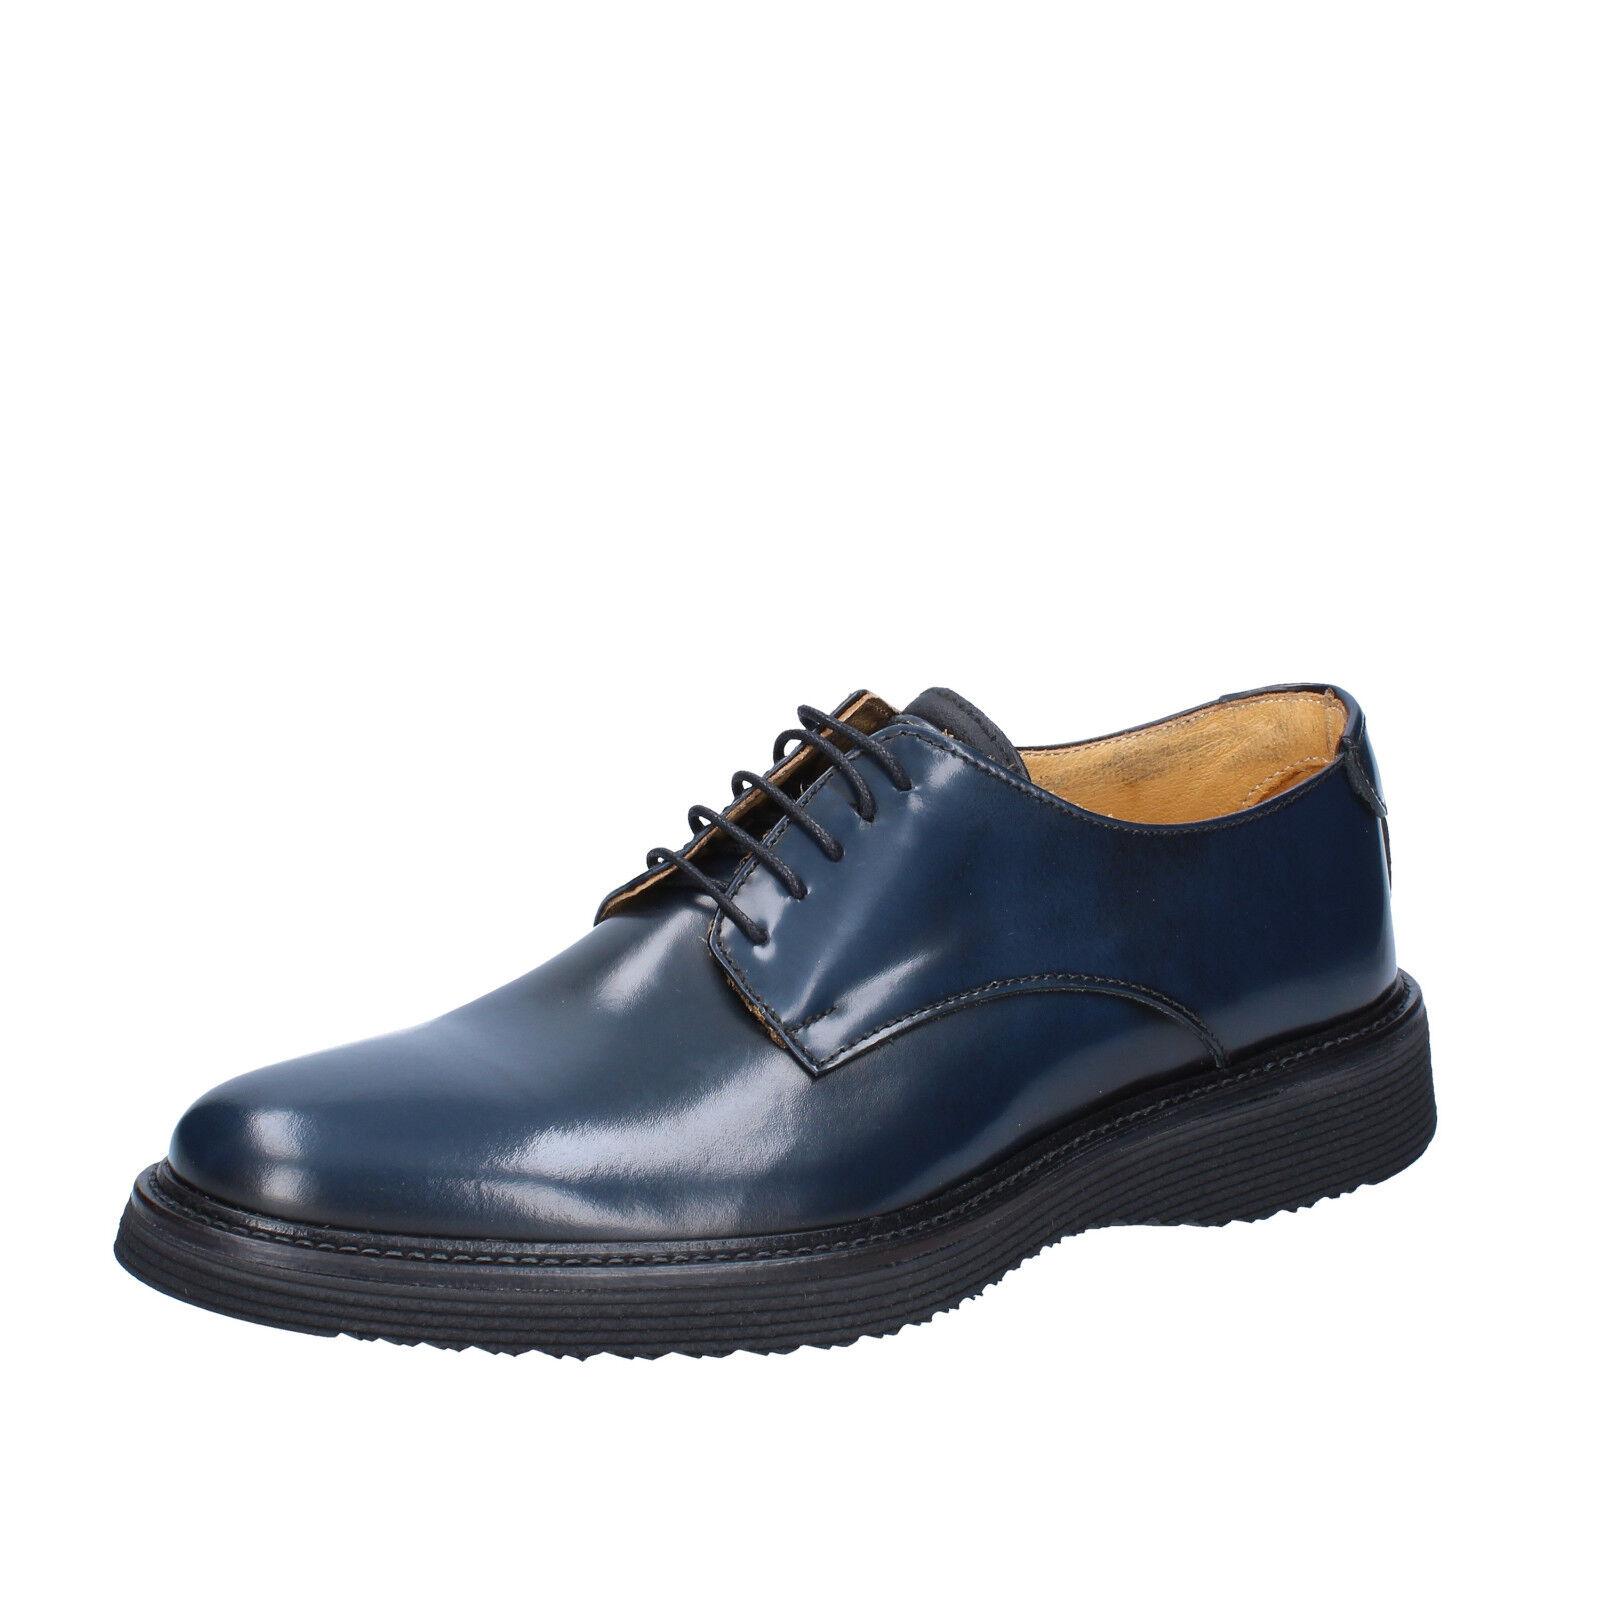 Mens shoes SALVO BARONE 8 ( EU 42 ) elegant bluee leather  BZ146-D